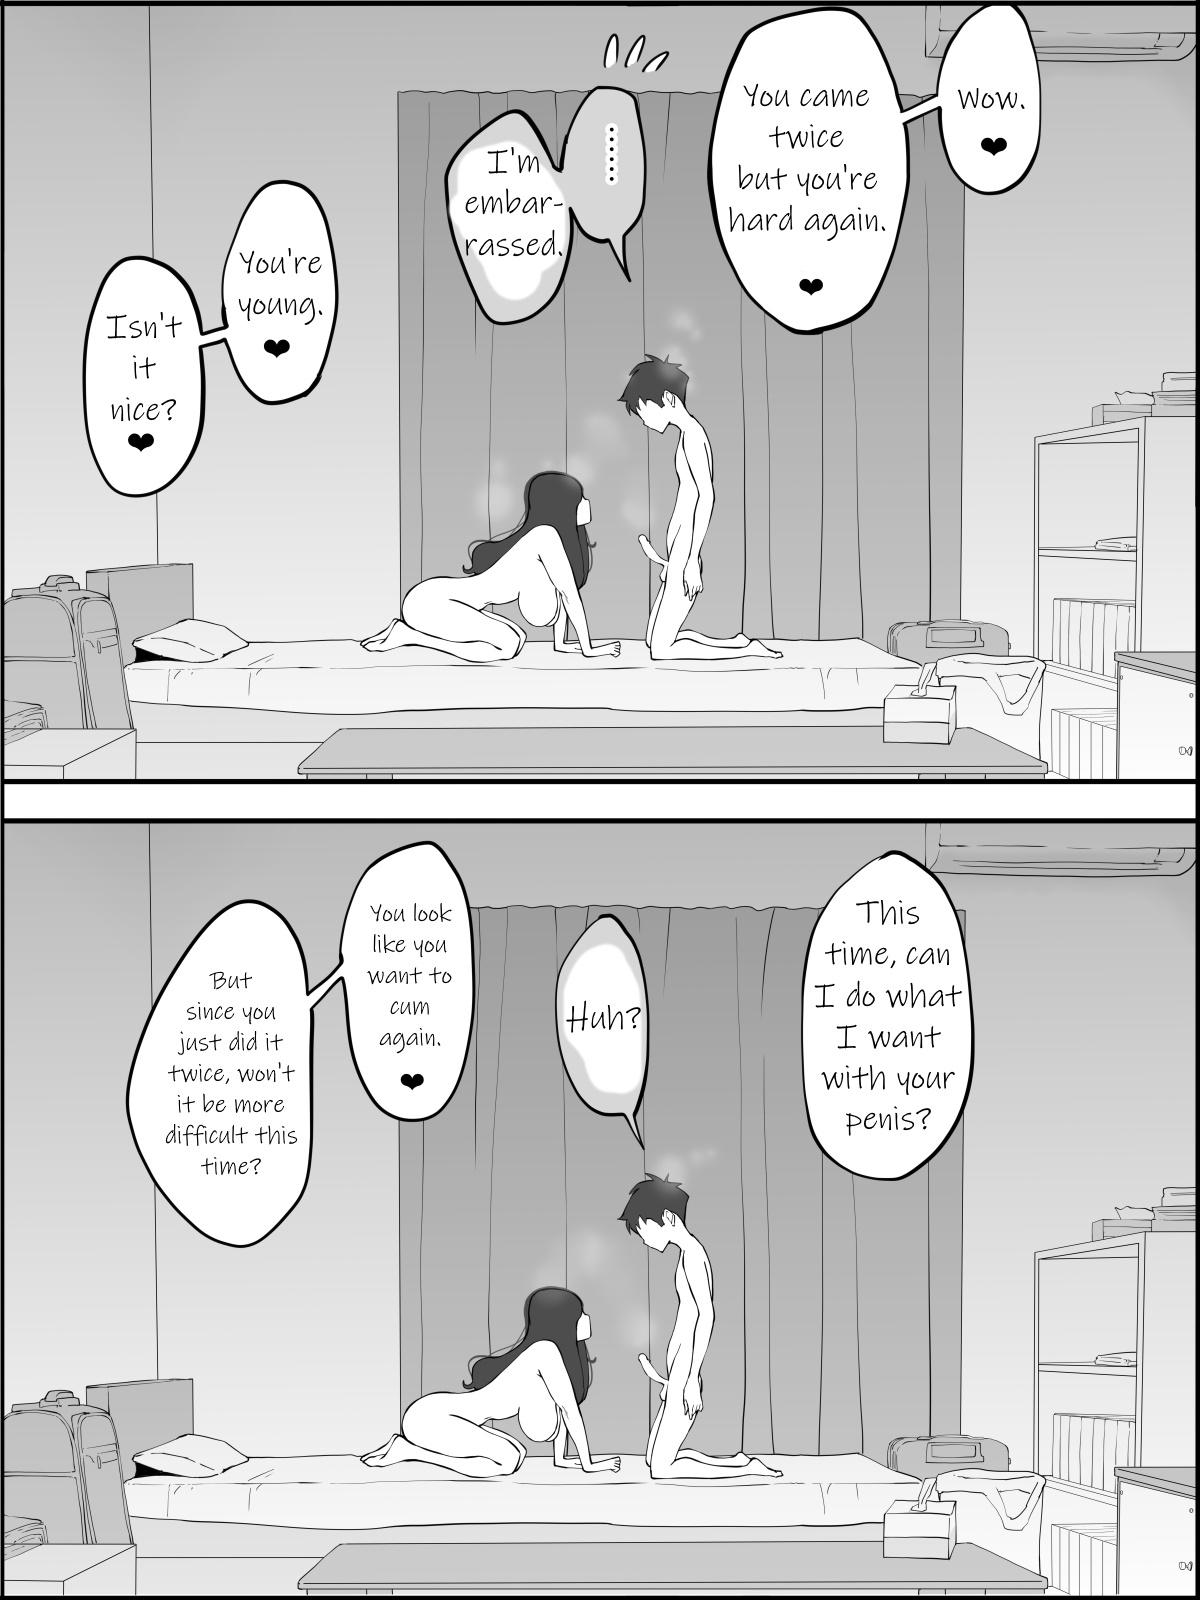 [Ailail (Ail)] Boku ni SeFri ga Dekita Riyuu ~Anzangata Oshiri no Hitozuma Hen~ | How I Made Sex Friends ~The Married Woman with Child-Bearing Hips~ [English] [KittyKatMan] 64